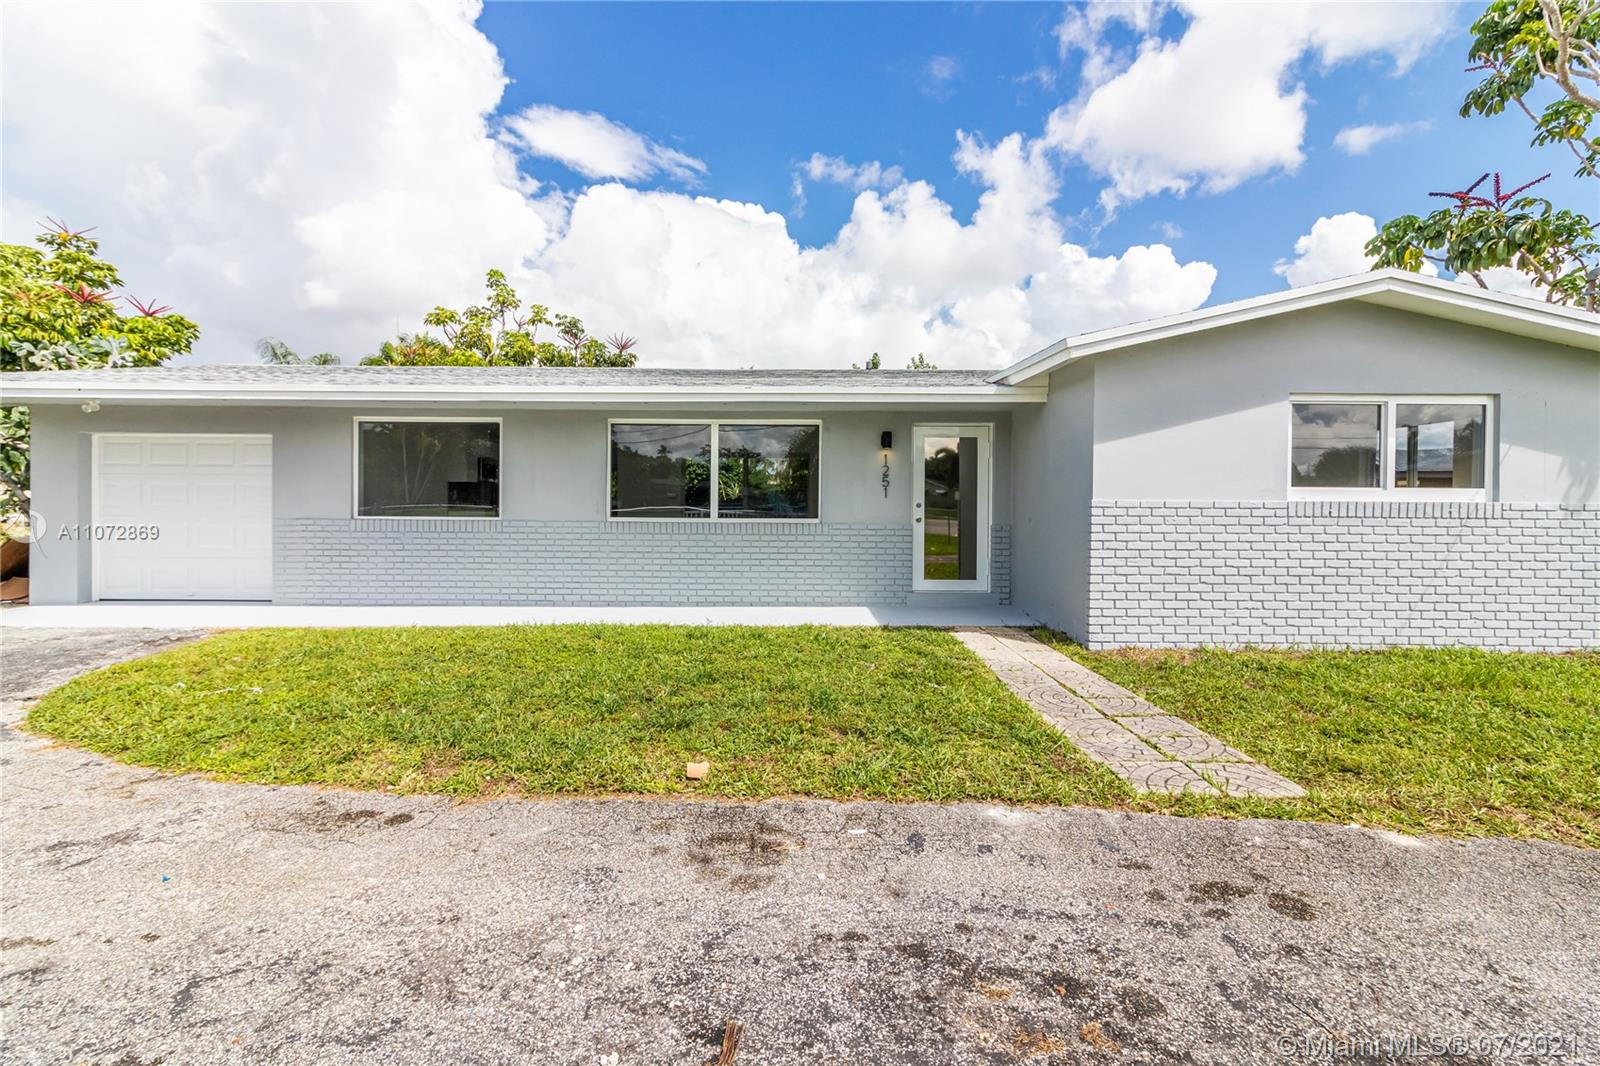 Sunrise Golf Village - 1251 NW 60th Ave, Sunrise, FL 33313